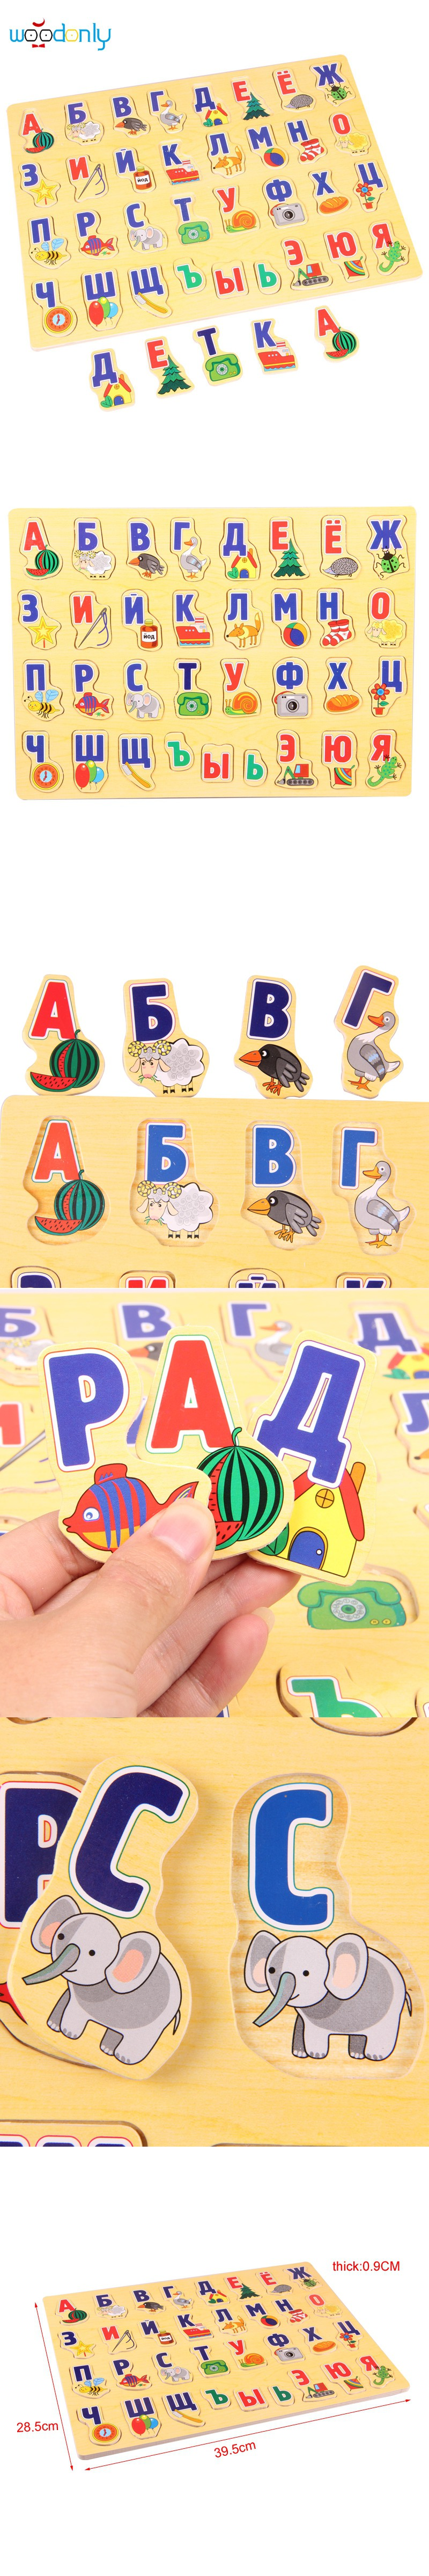 Wooden Russian Alphabet Puzzles toys for children Montessori Board